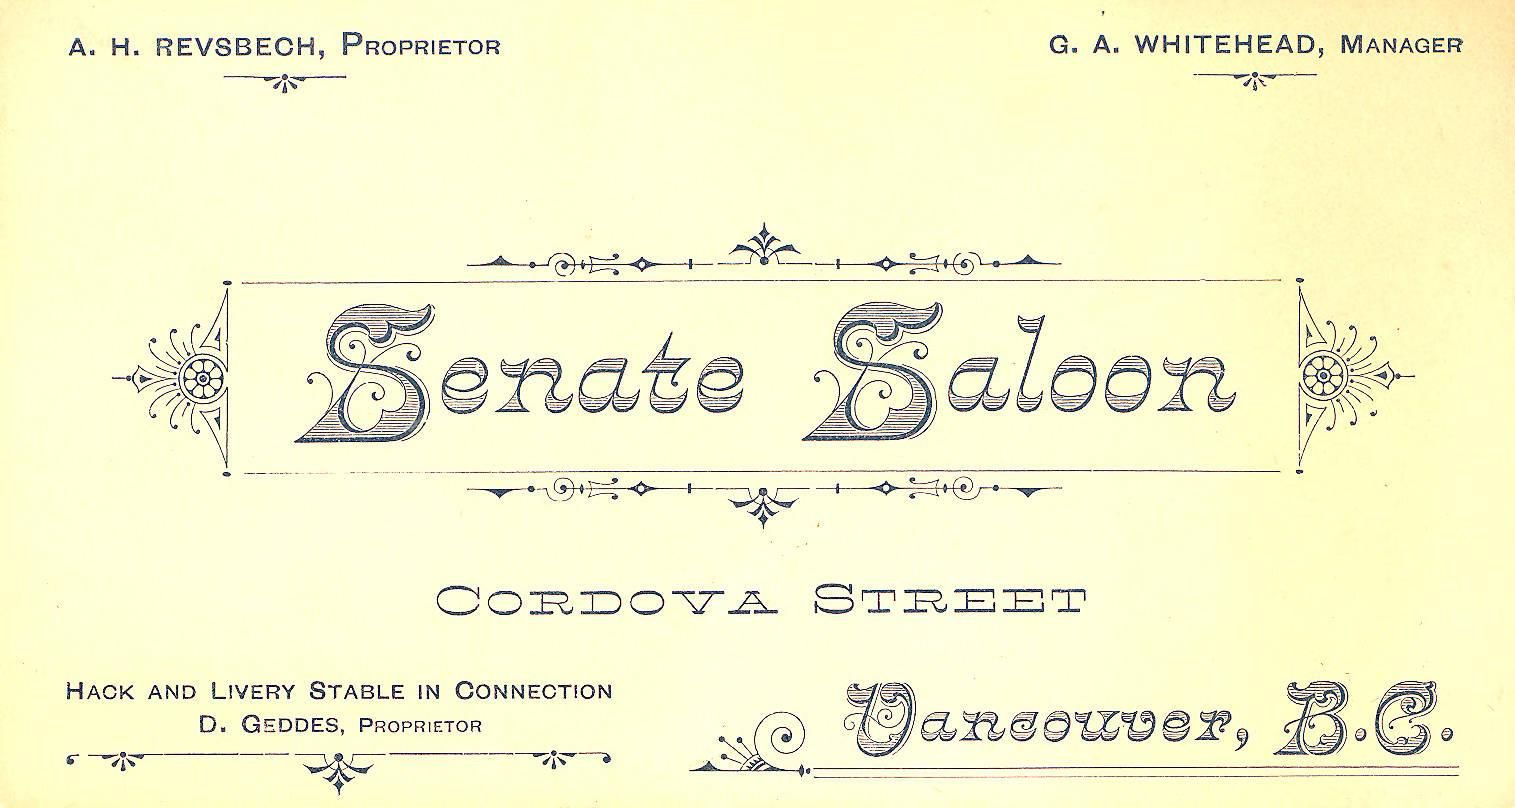 Business card for the senate saloon robert mathison printer business card for the senate saloon robert mathison printer vancouver 1890 reheart Gallery